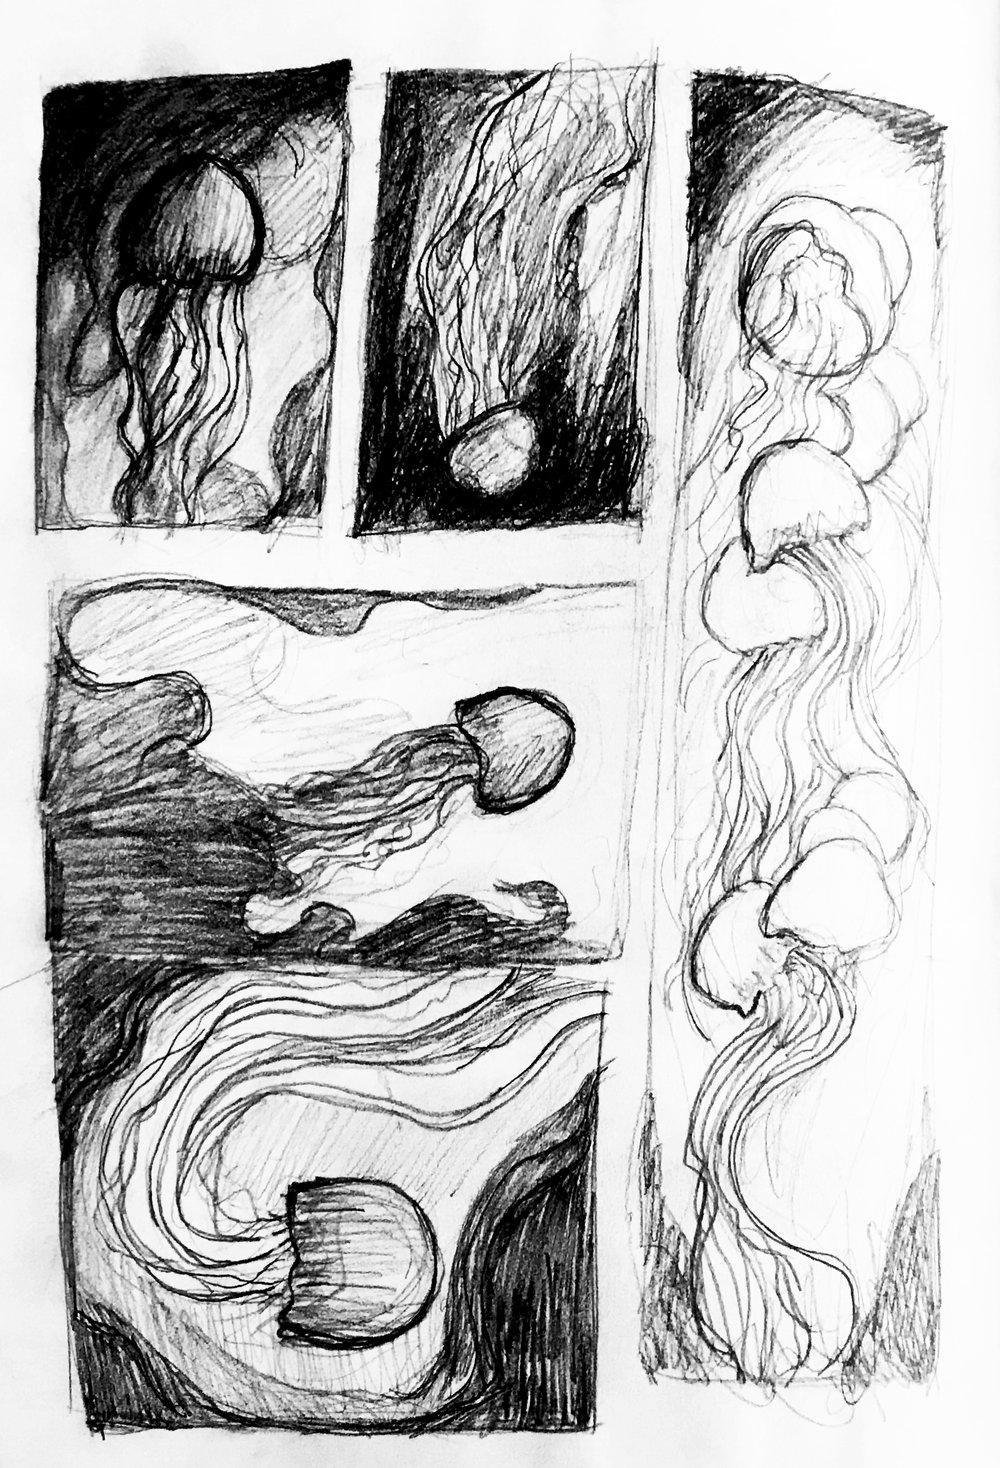 Sketch-Seascape-11.jpg